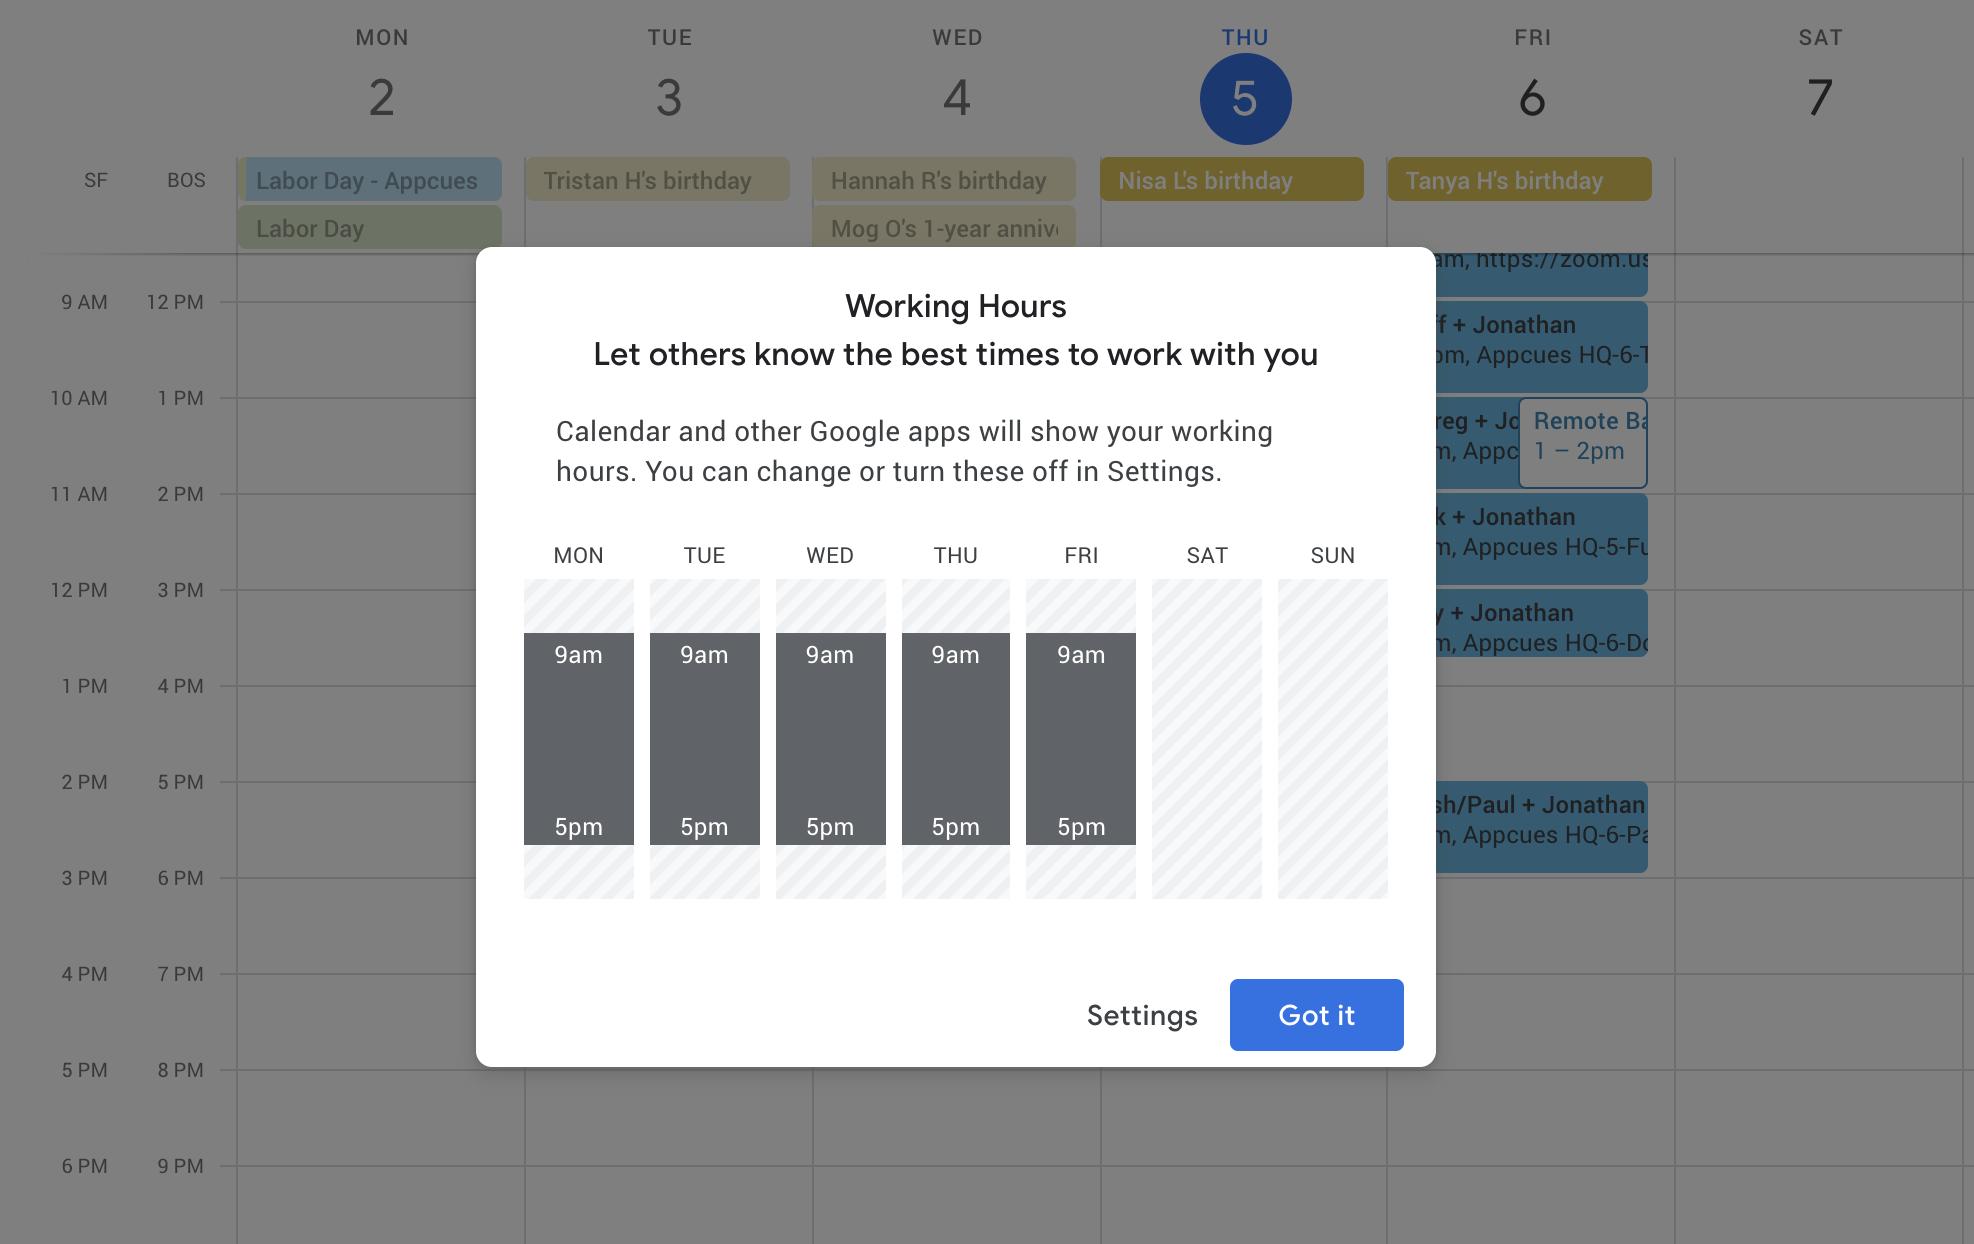 google calendar confirm working hours modal window